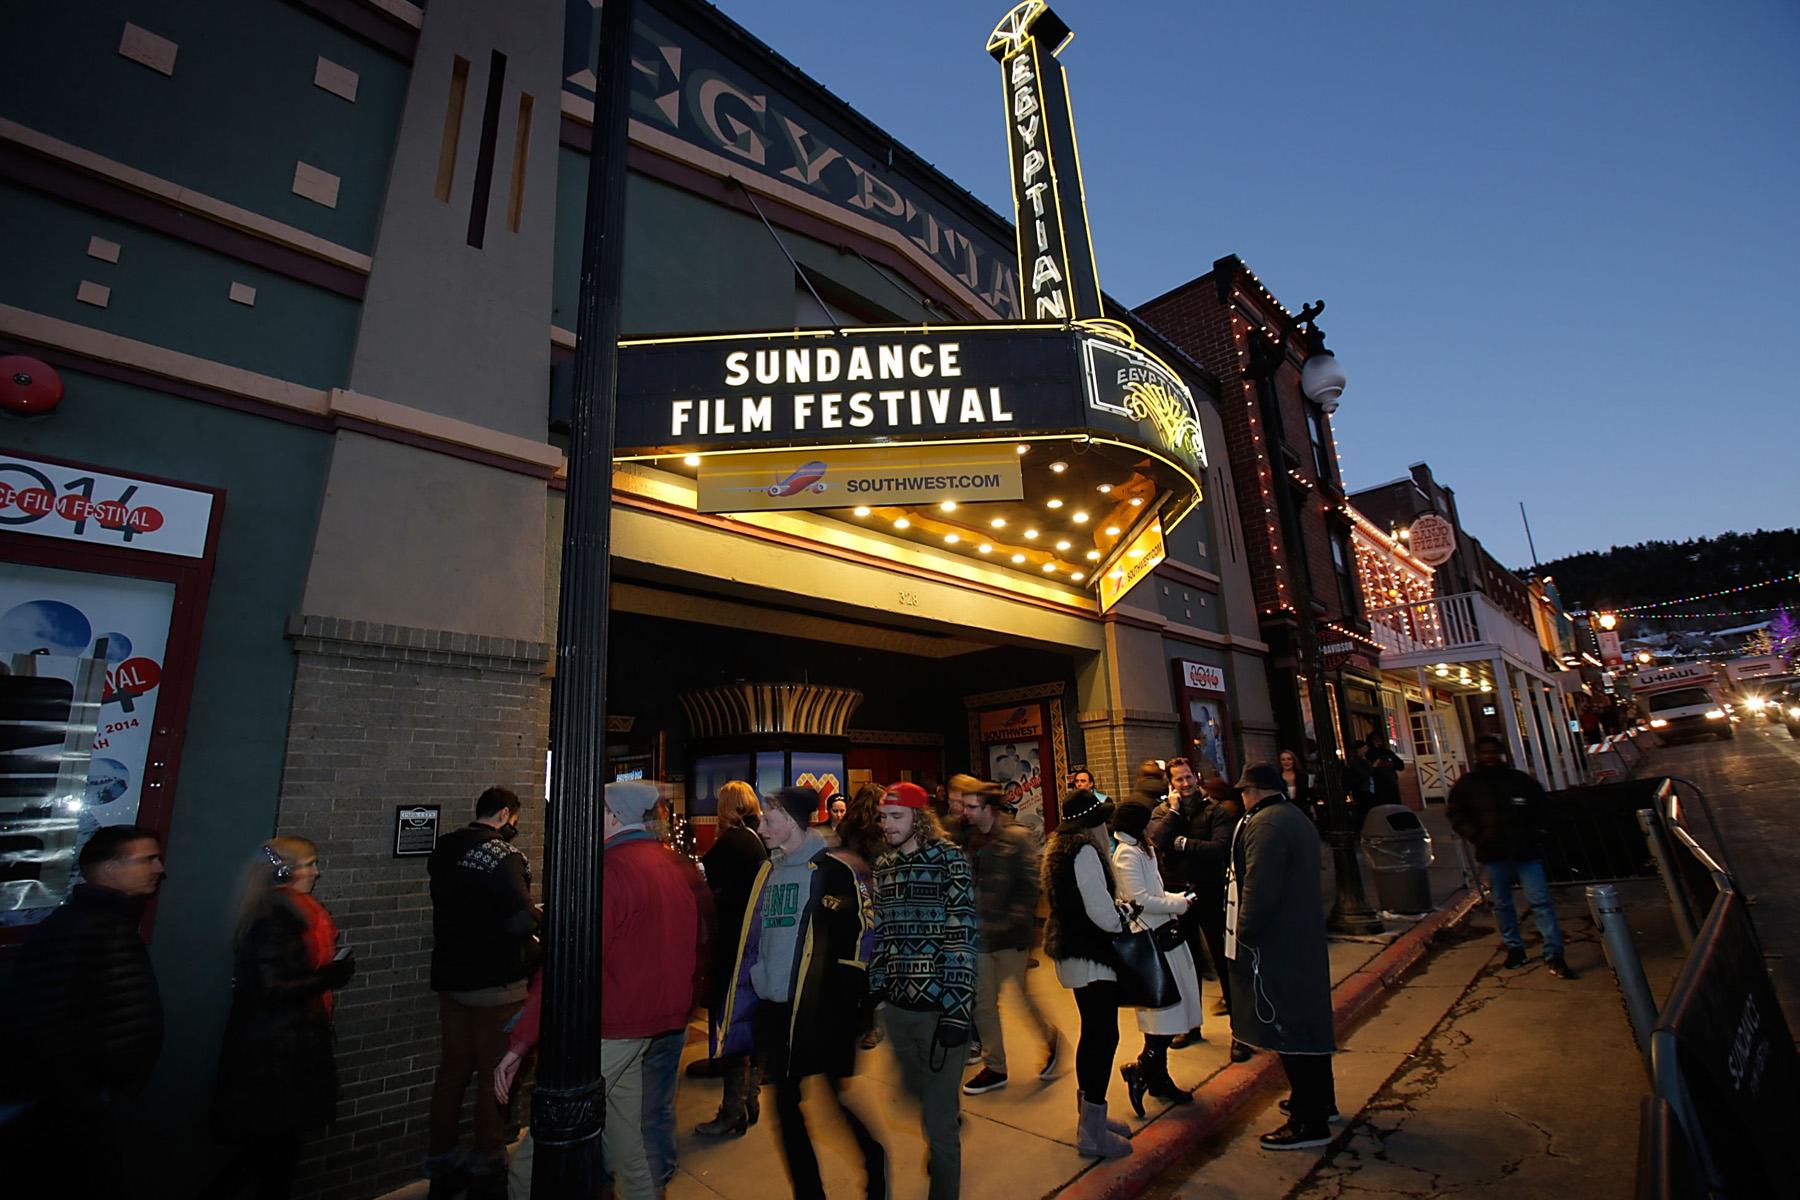 Taco Fiestas & Diego Luna Sightings: A Recap of Everything Latino at Sundance 2015